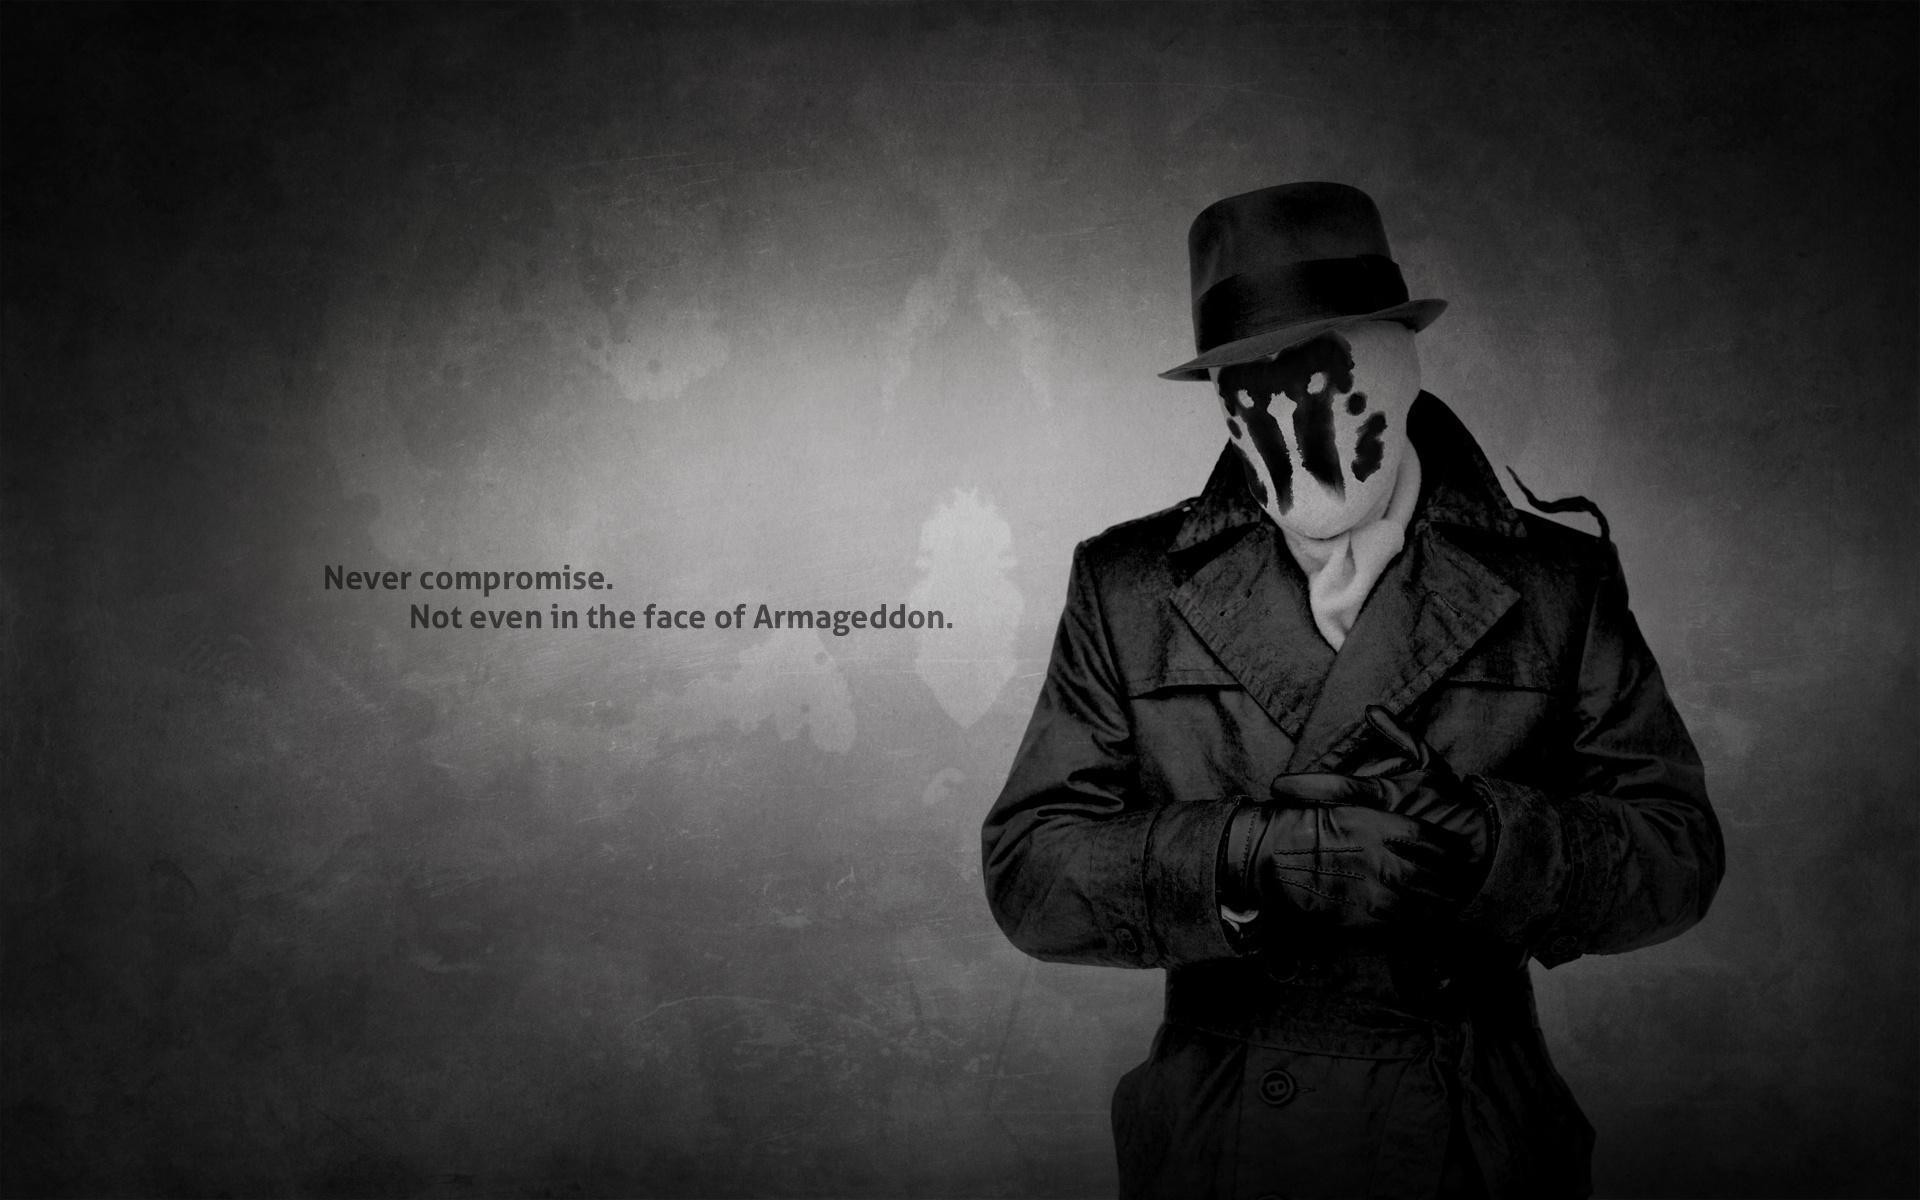 text quotes rorschach monochrome hats